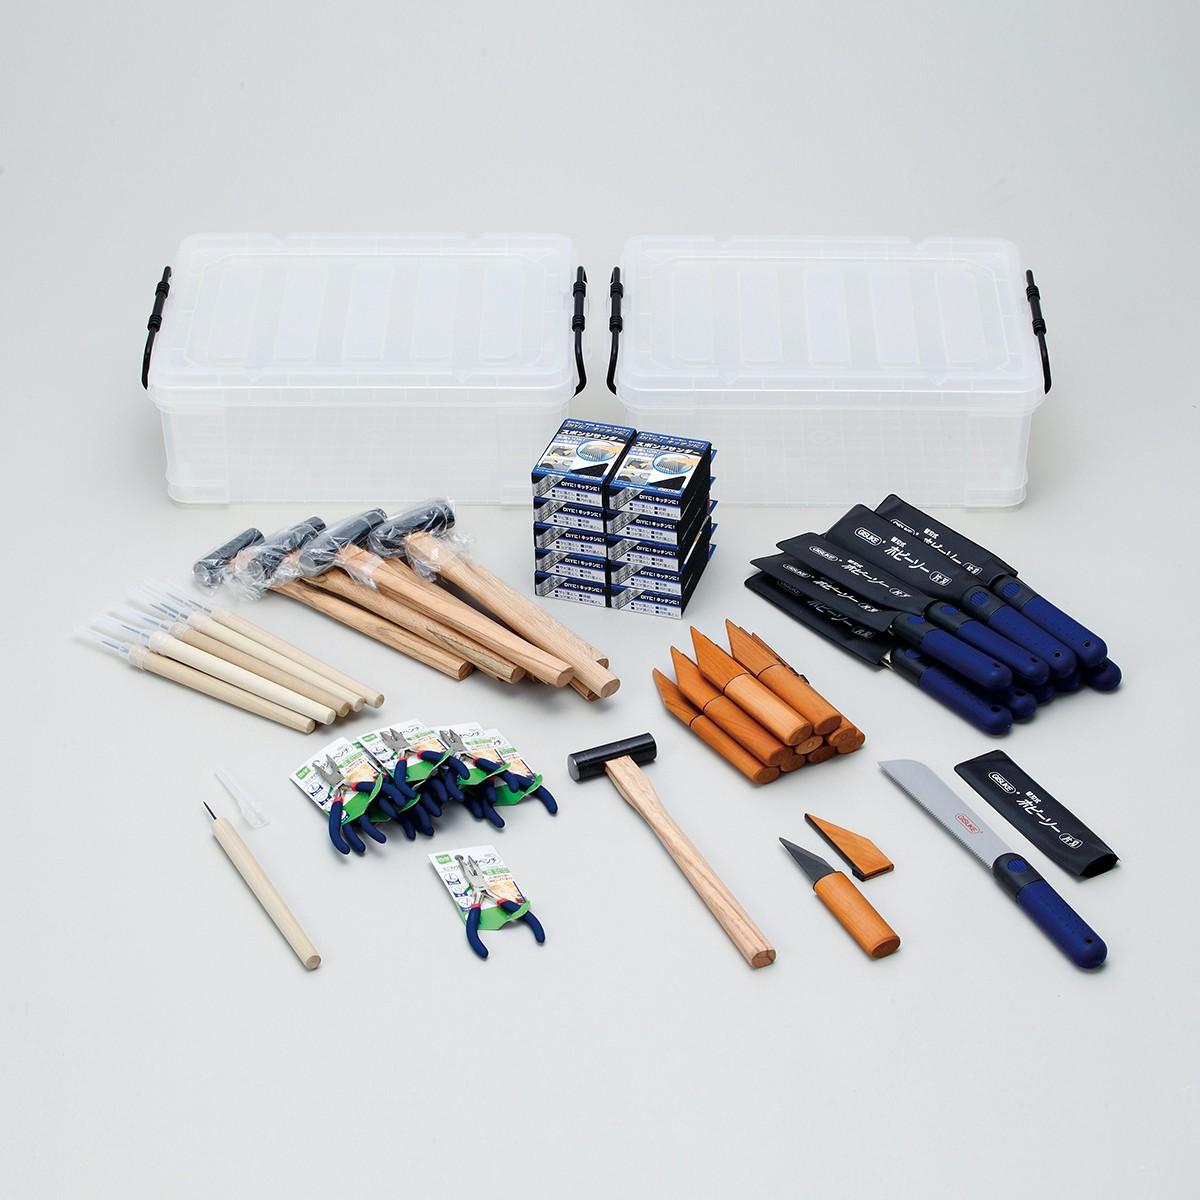 BSSスクール木工具 グループセット 10人用 GT10 【 木工 木彫 木工具 セット 】